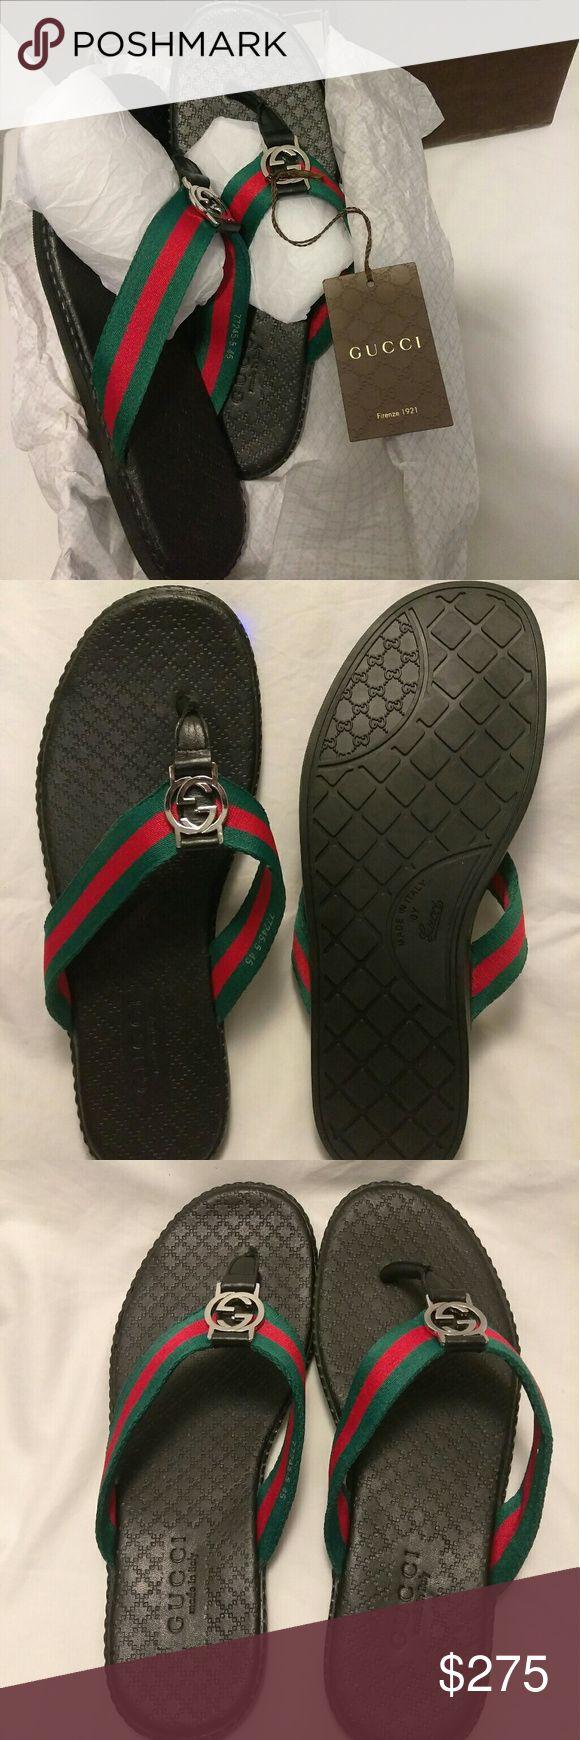 Gucci Men Sandals size 12 Brand New, Gucci men sandals size 11:5- 12,Italian size (45) , Comes with Original box, dust bag + Shopping bag. Retail price is 5480 Gucci Shoes Sandals & Flip-Flops